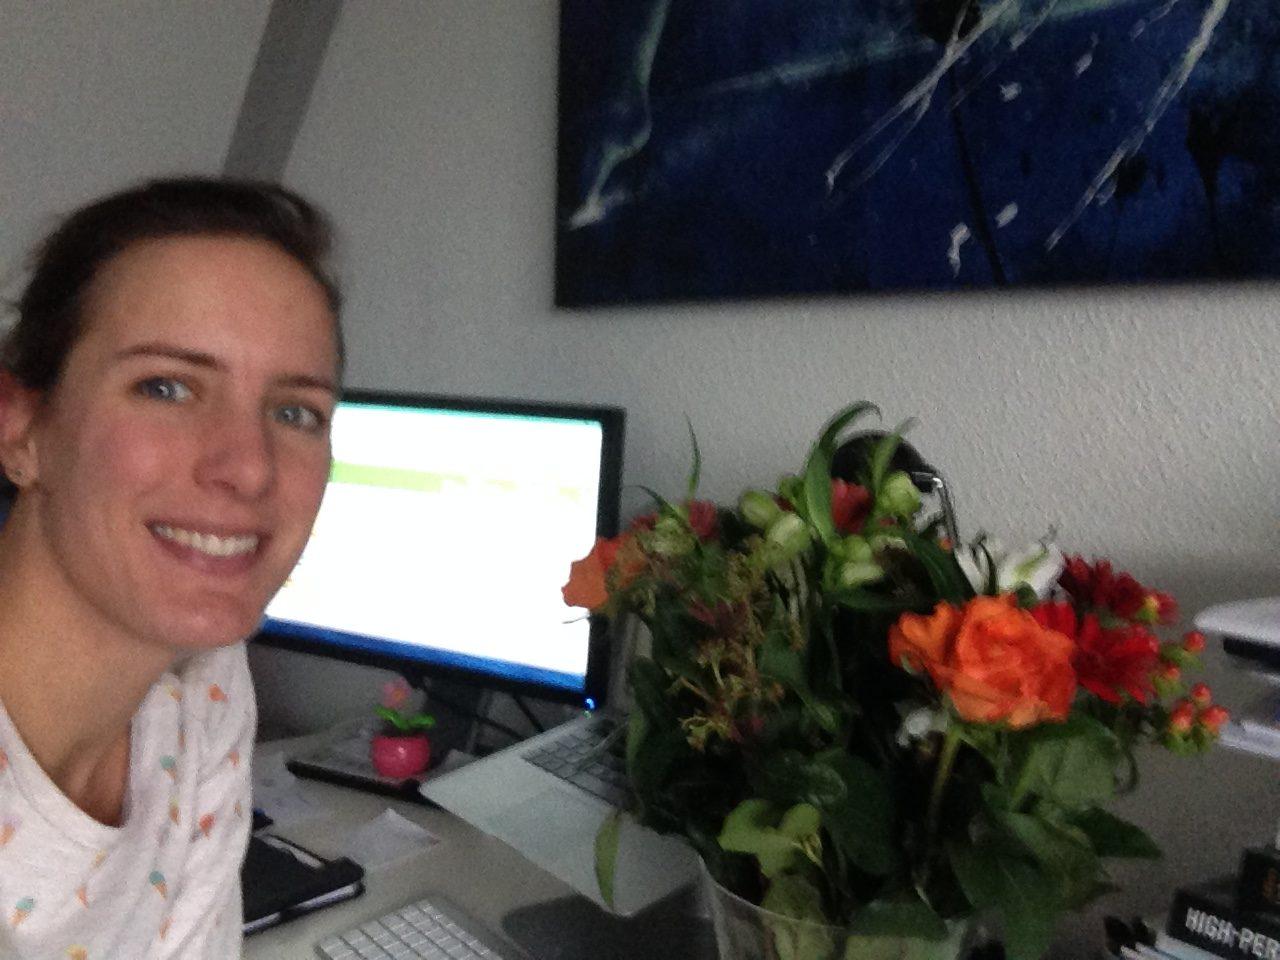 1 januari 2017; Trainingsbegeleiding Jolanda Spruit Officieel van start!